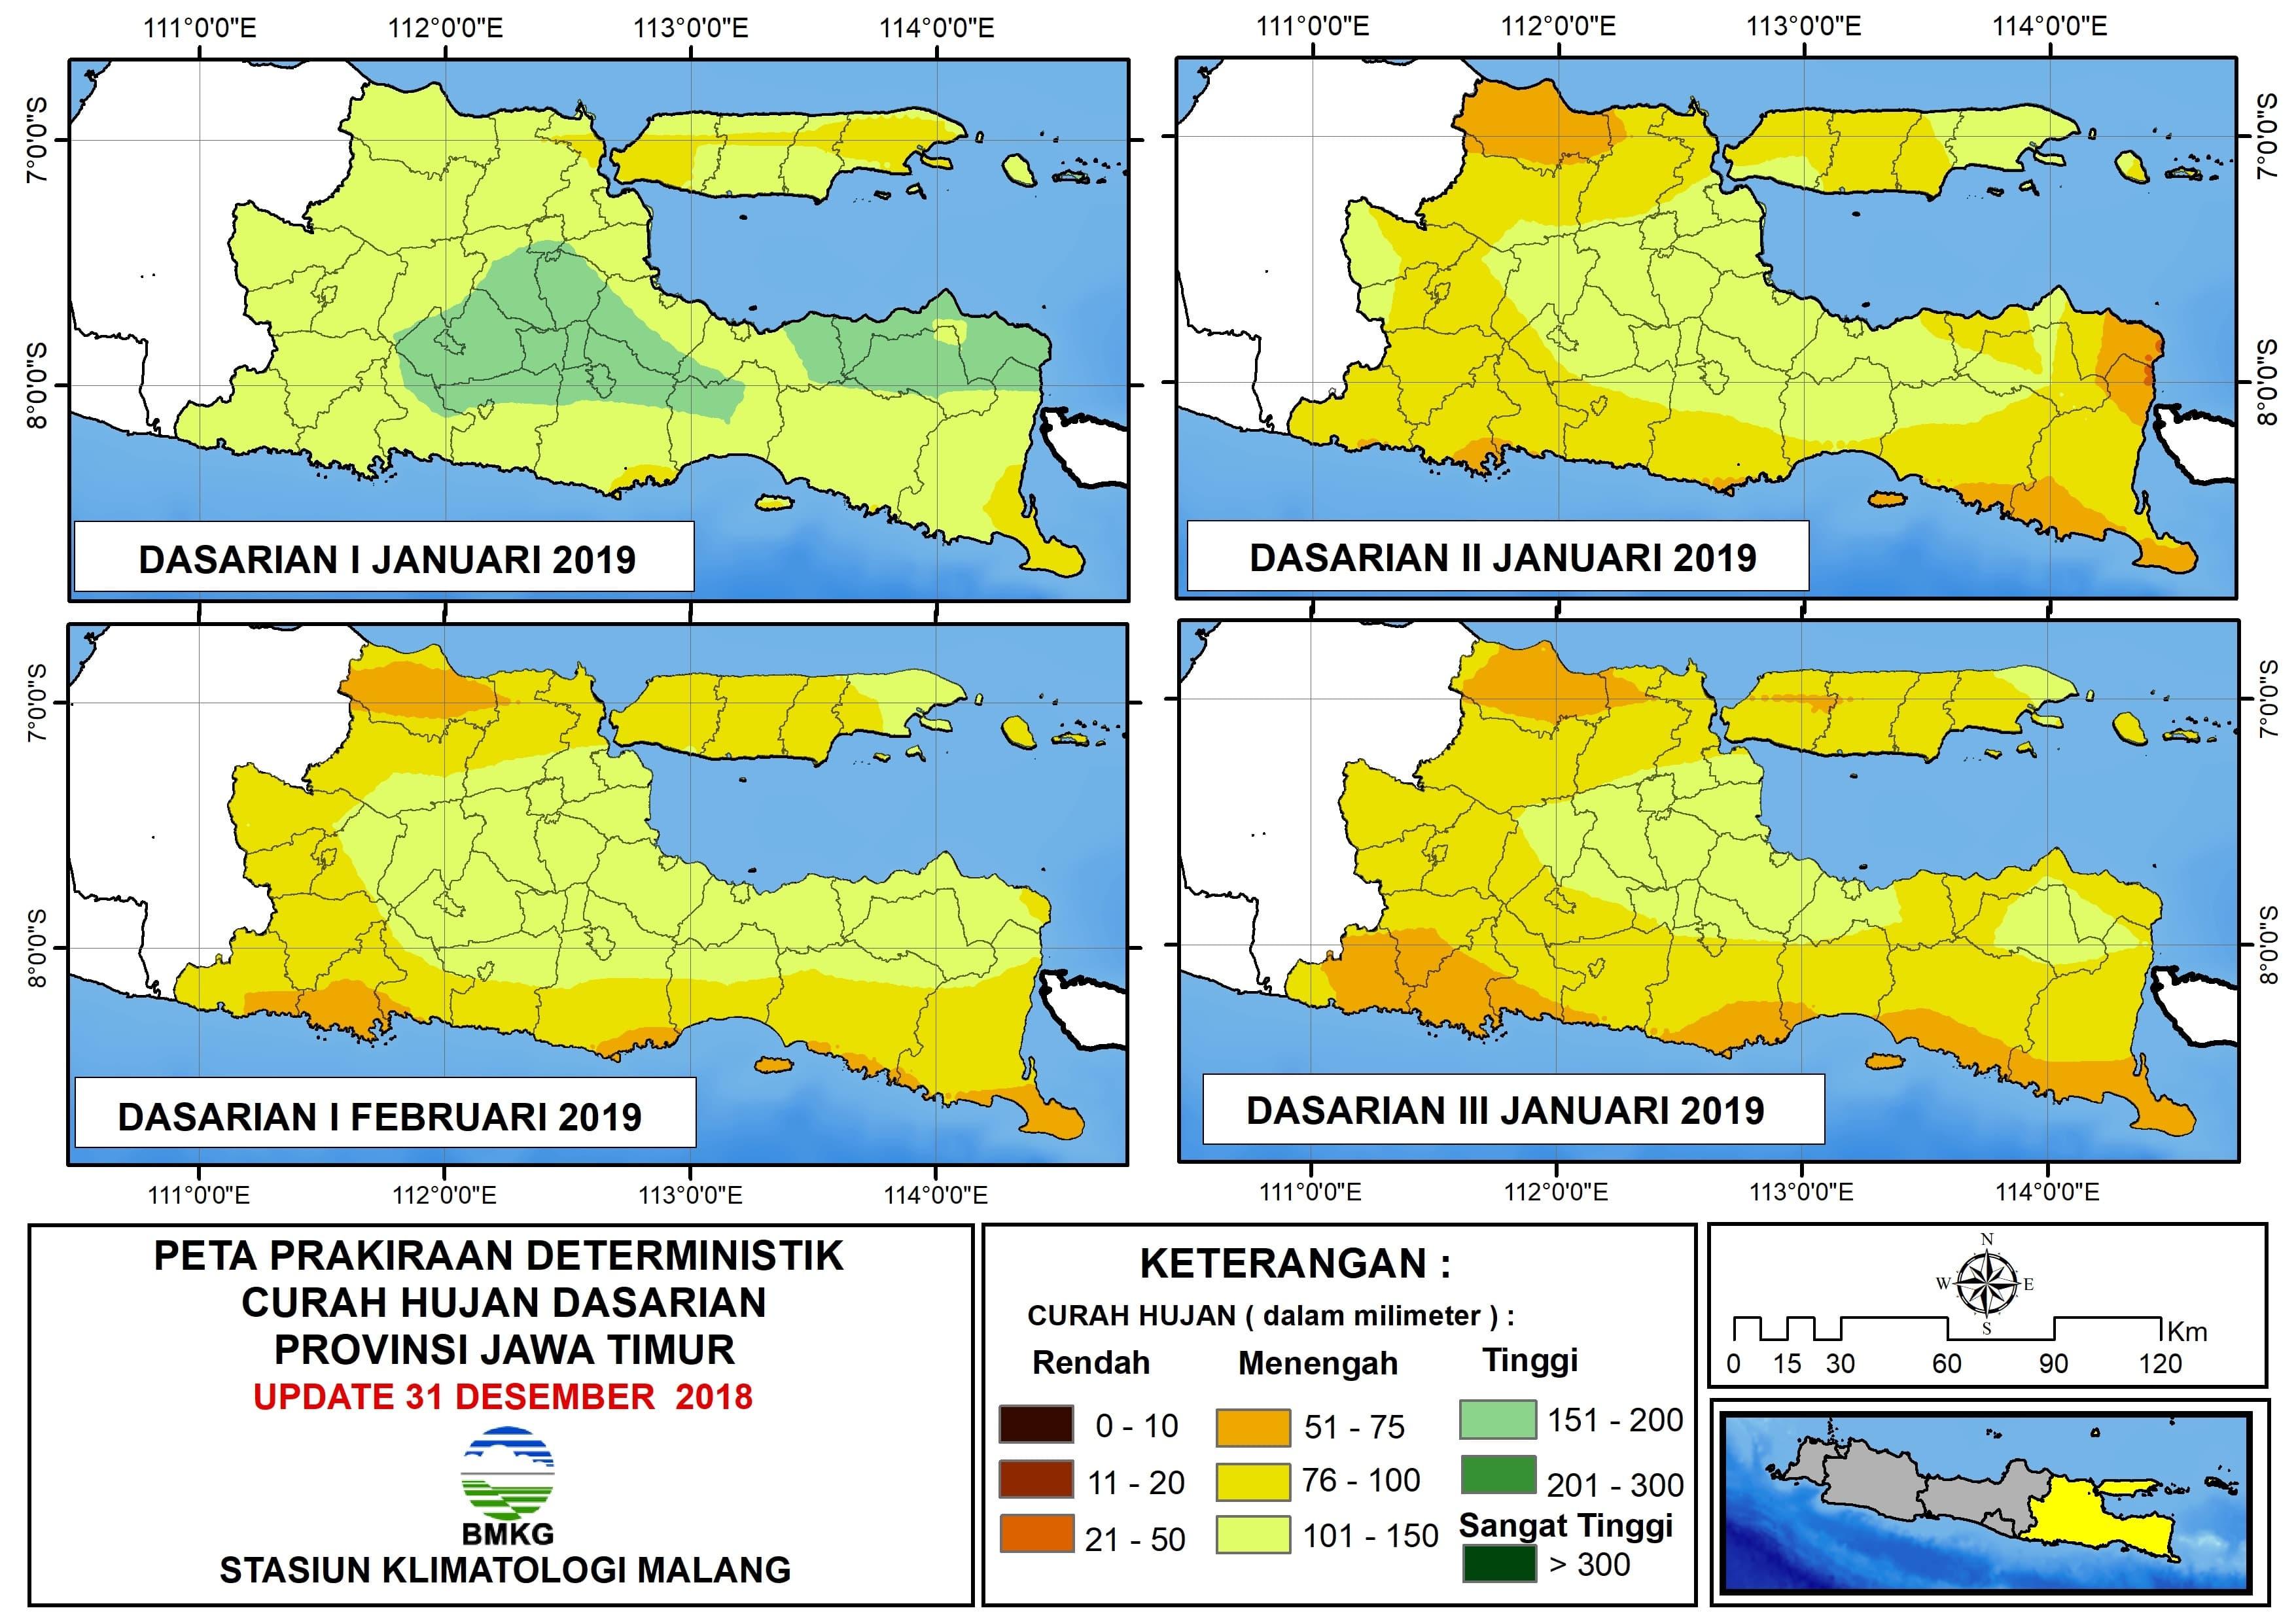 Peta Prakiraan Deterministik Curah Hujan Dasarian Provinsi Jawa Timur Update 30 Desember 2018